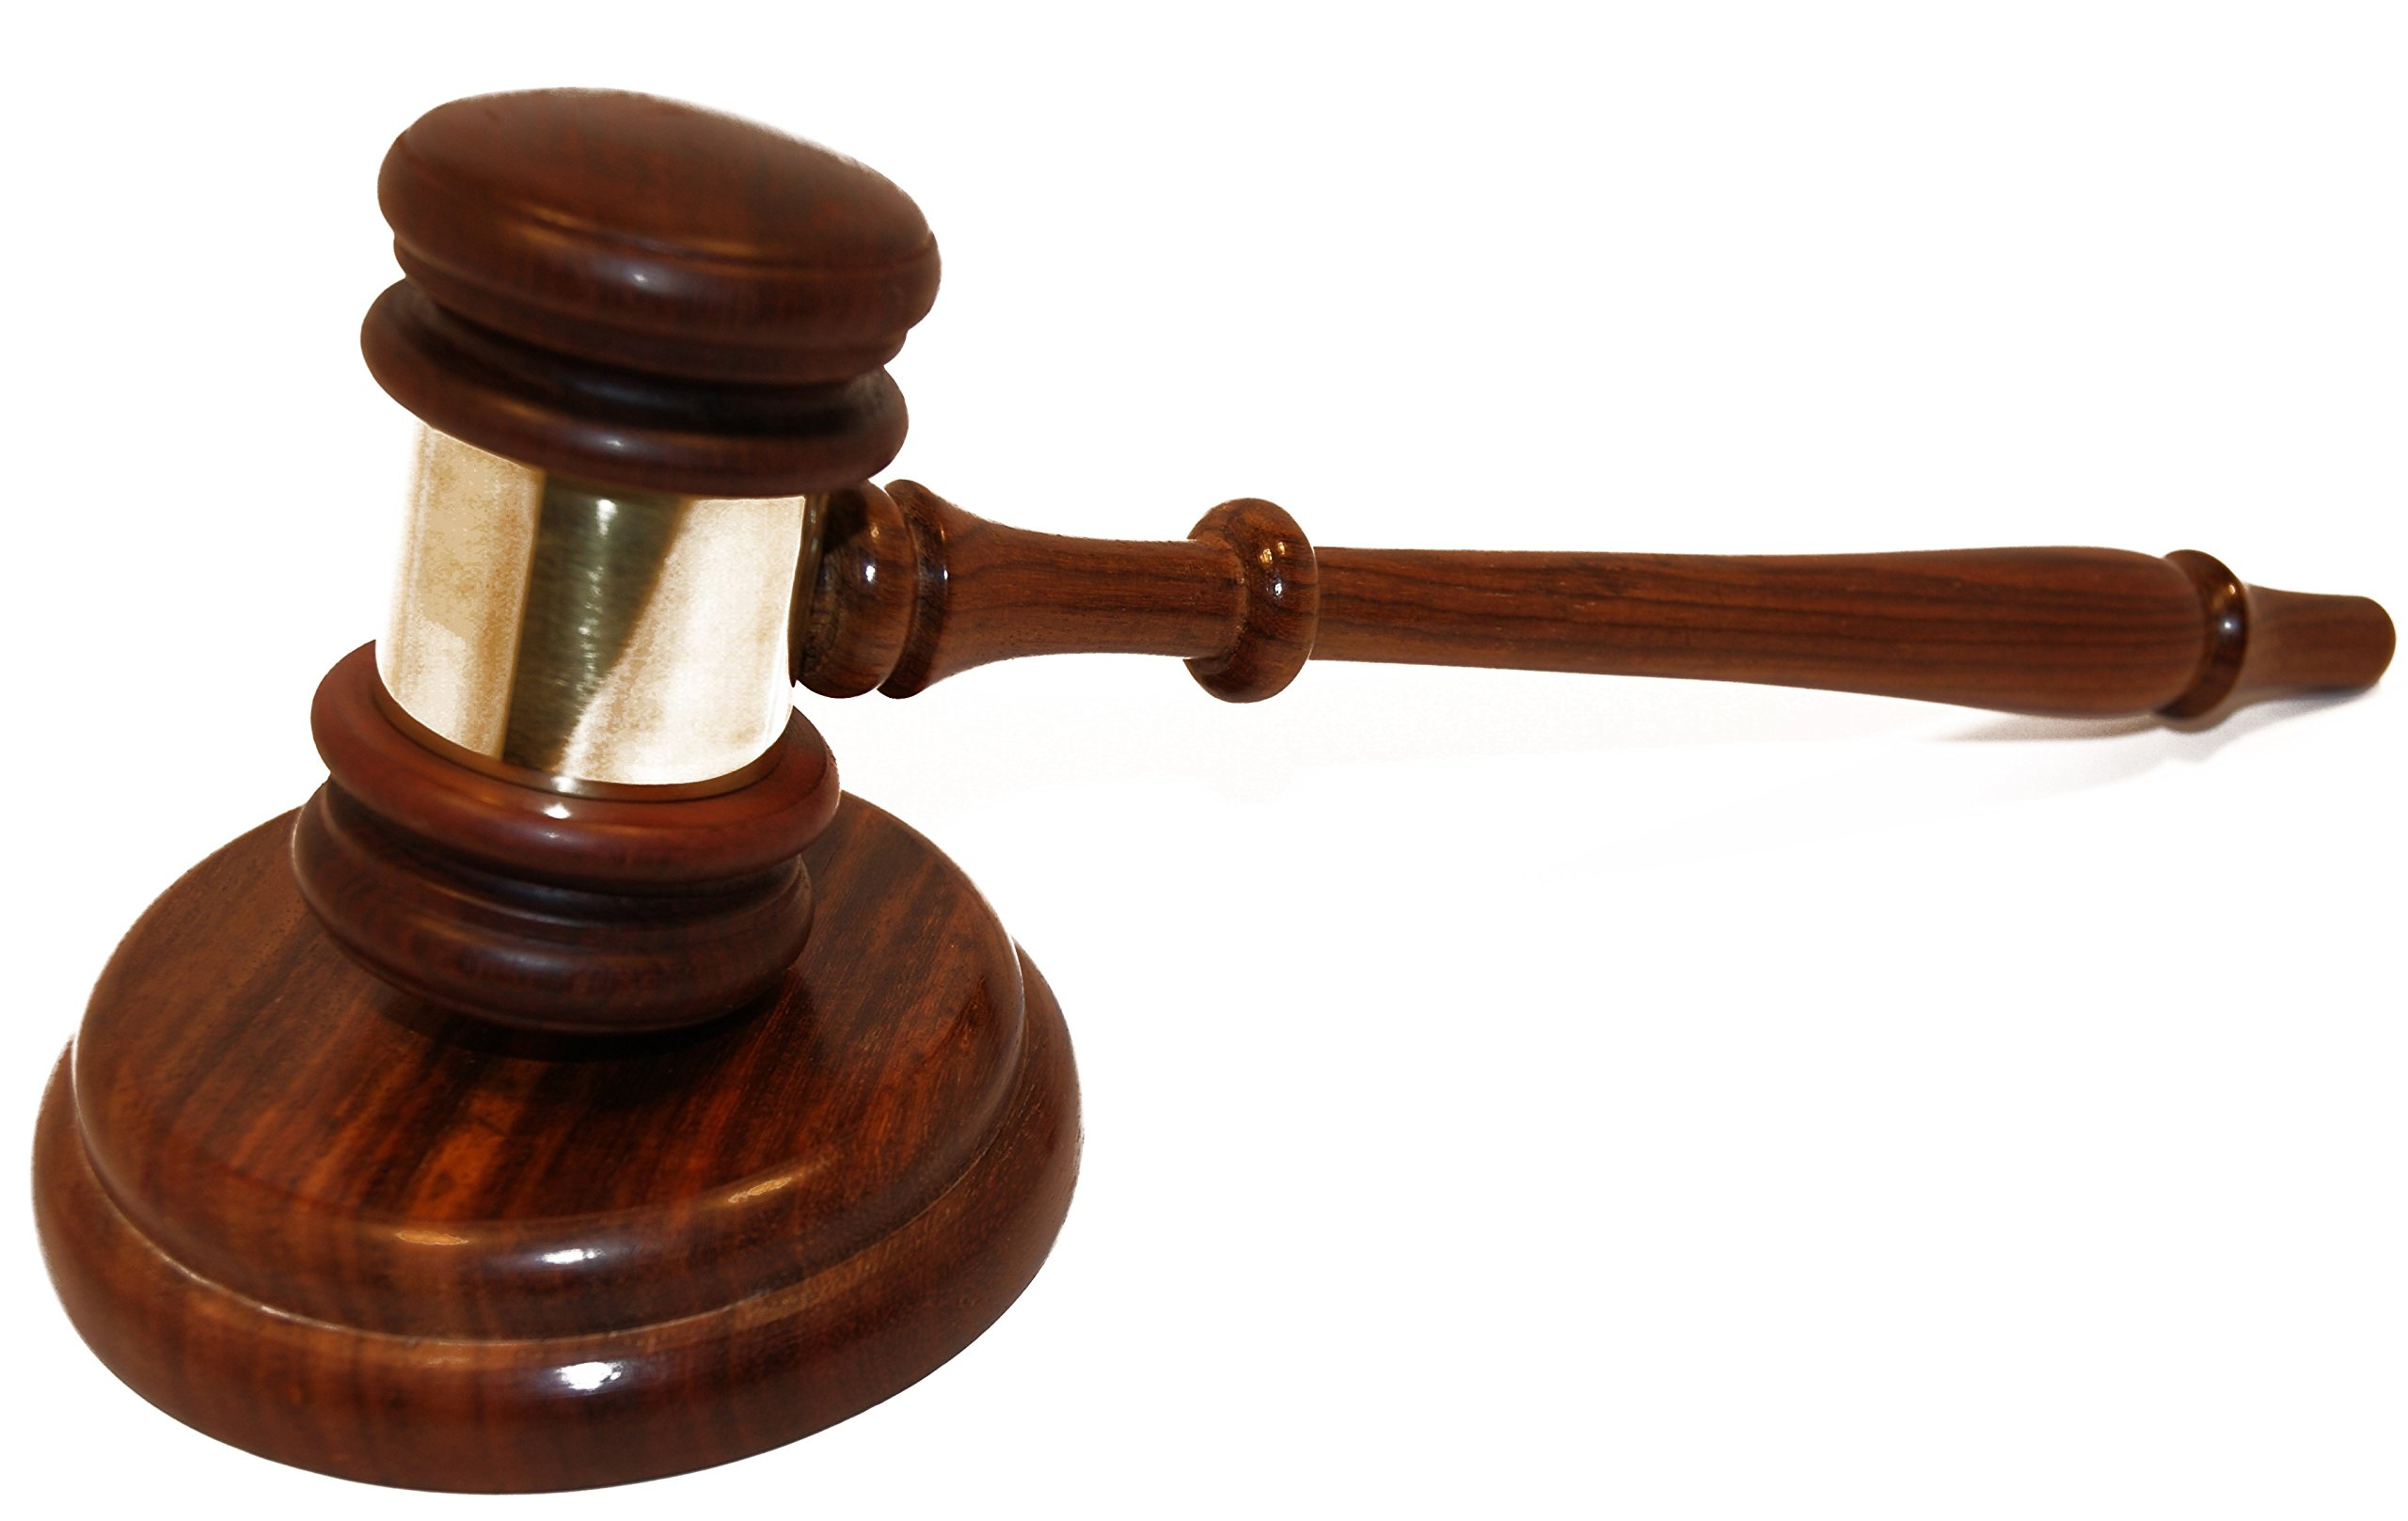 Judge's Gavel with Striking Block